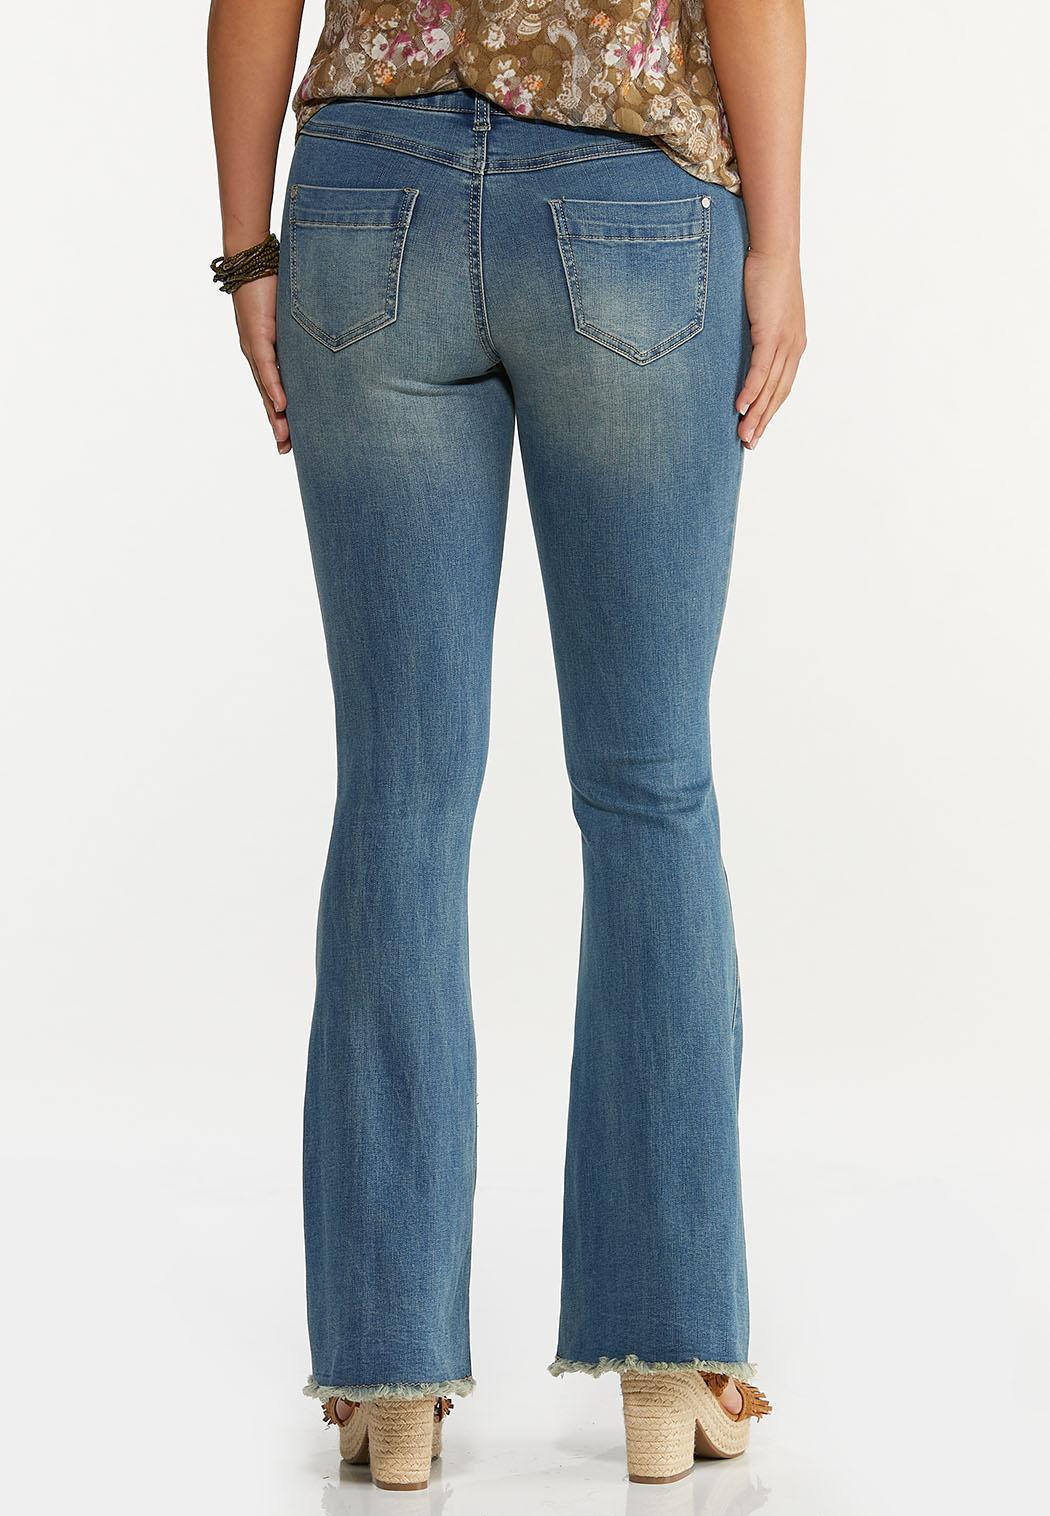 Distressed Flare Jeans (Item #44626938)